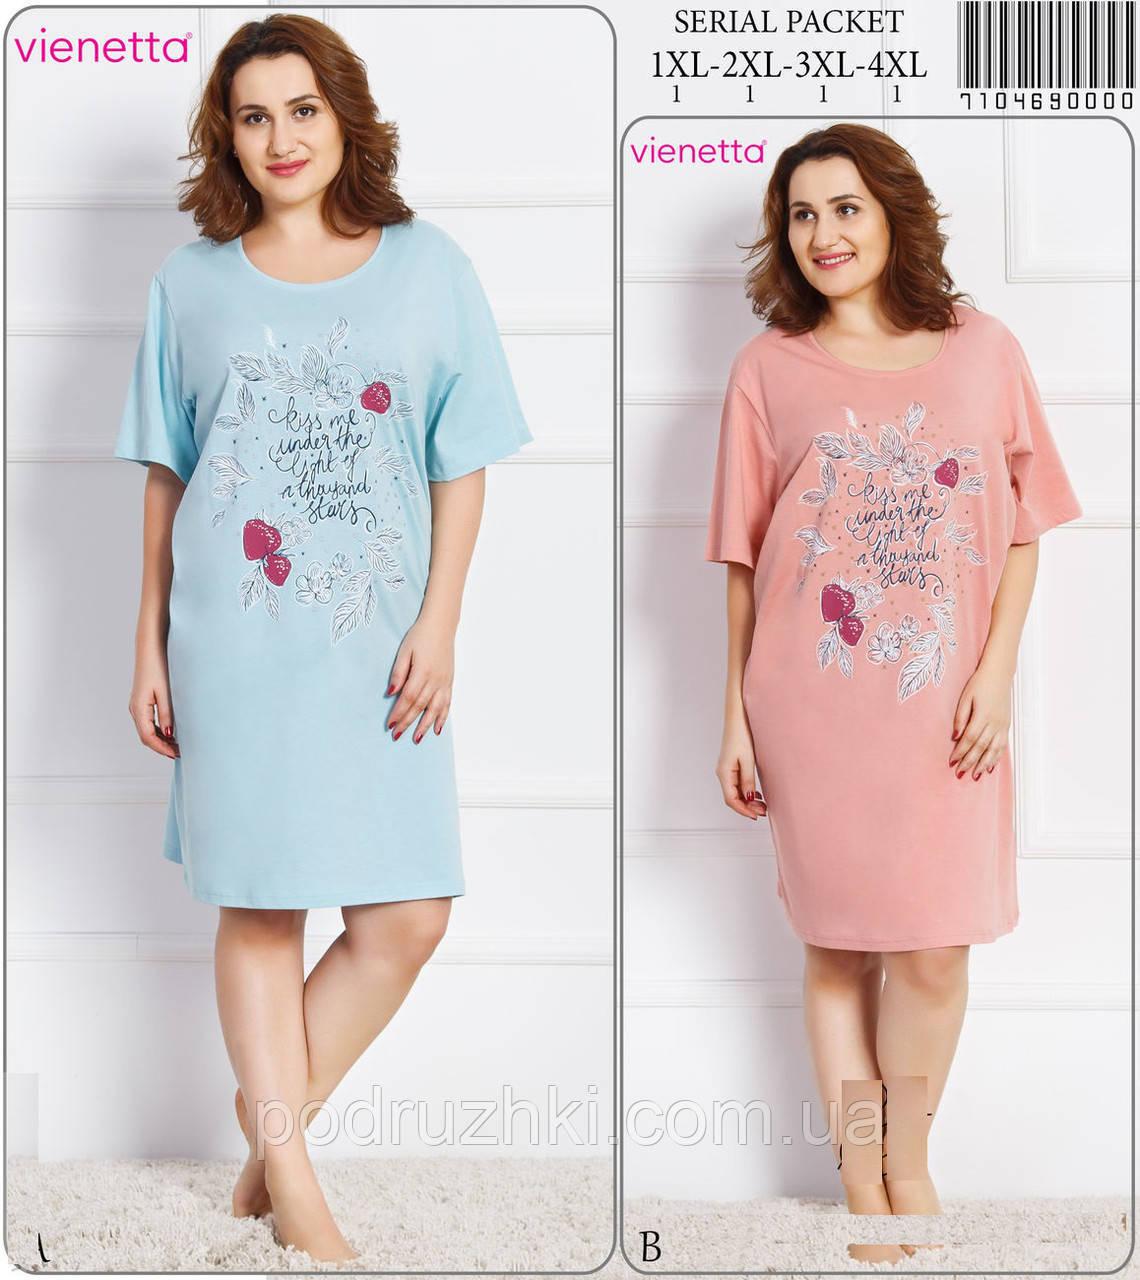 2f3b3c54da4fa77 Ночная сорочка (туника) большого размера VIENETTA - Интернет-магазин